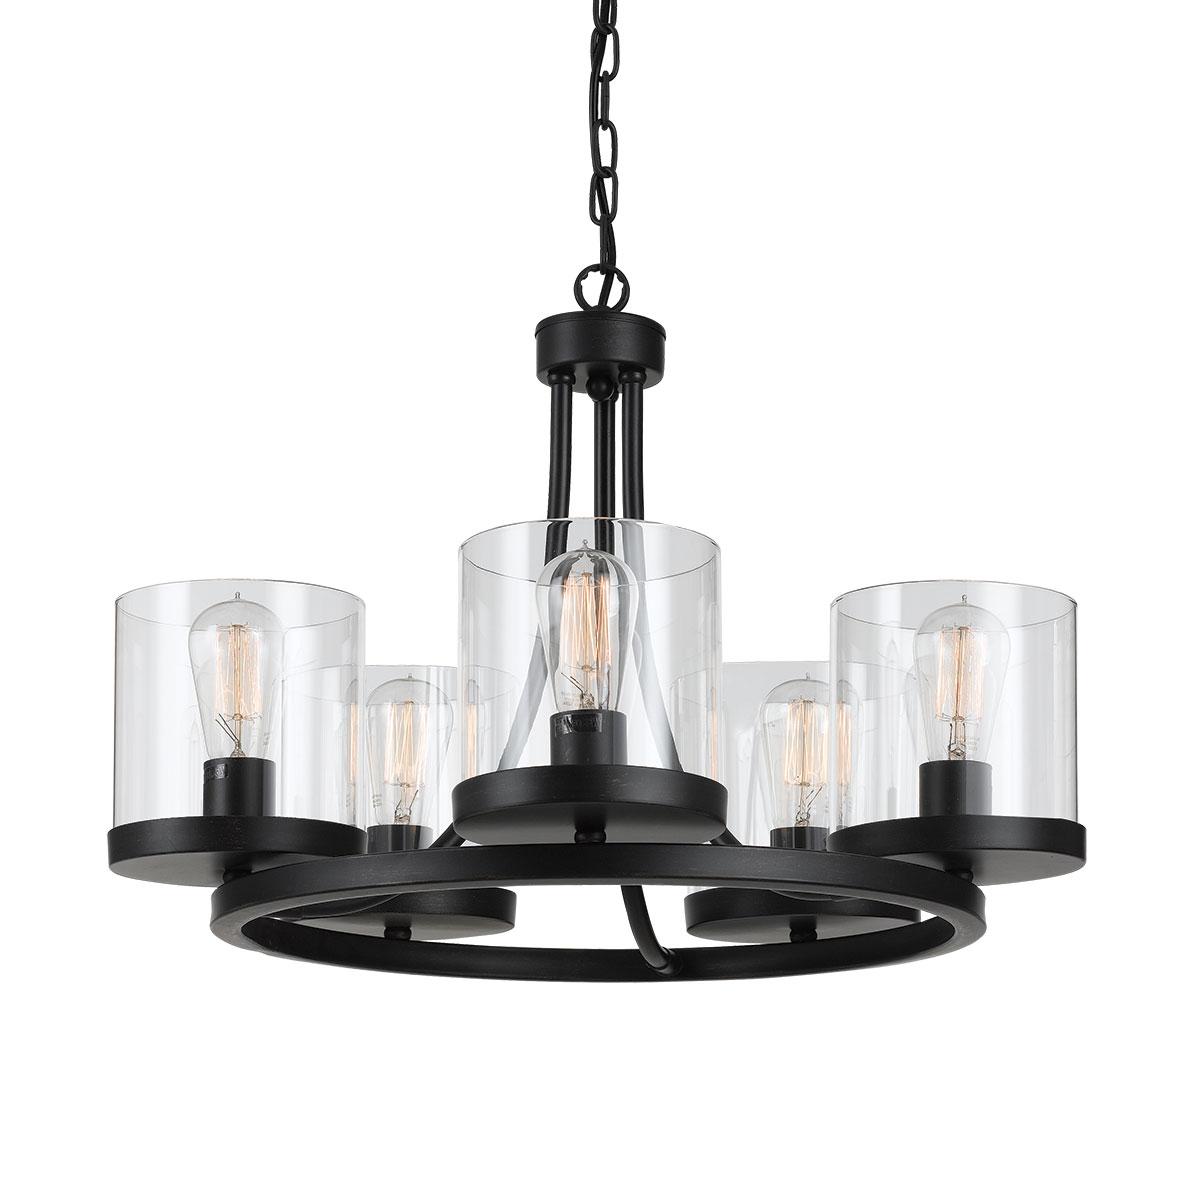 Largo 5 light small chandelier online lighting largo 5 light small chandelier aloadofball Image collections